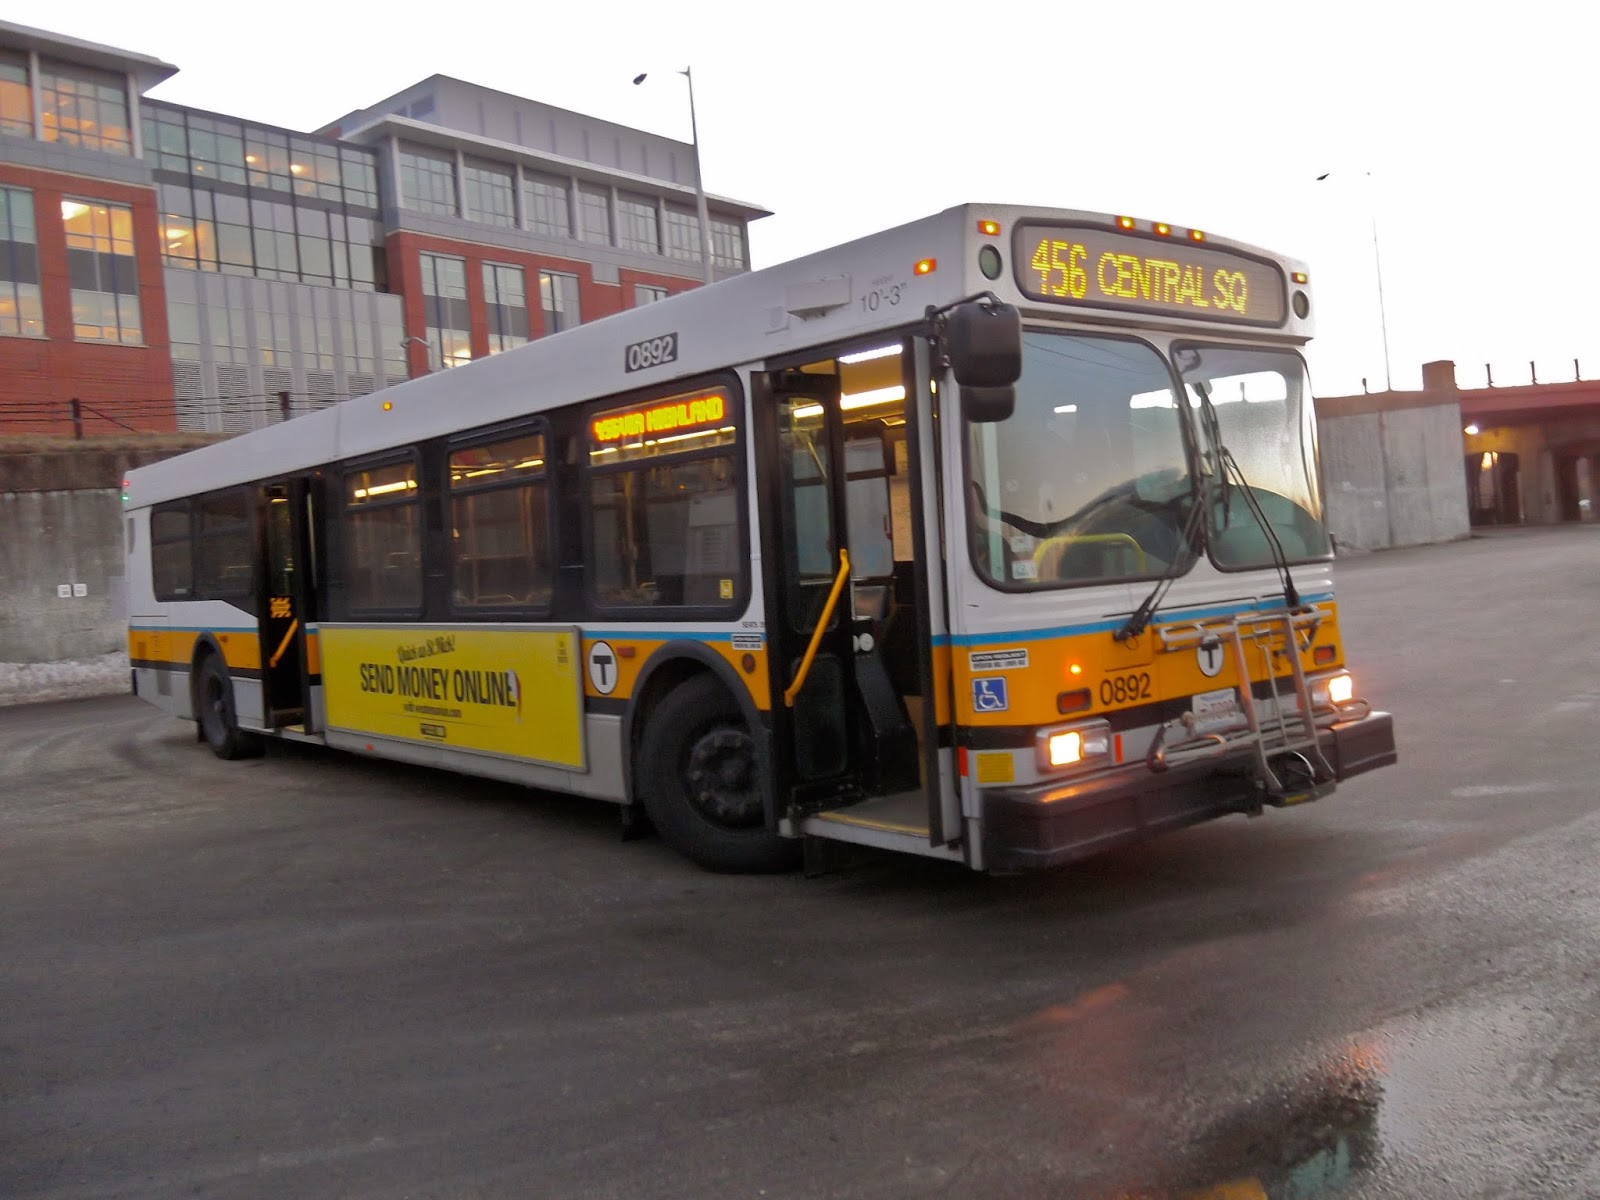 Miles On The Mbta 456 Salem Depot Central Square Lynn